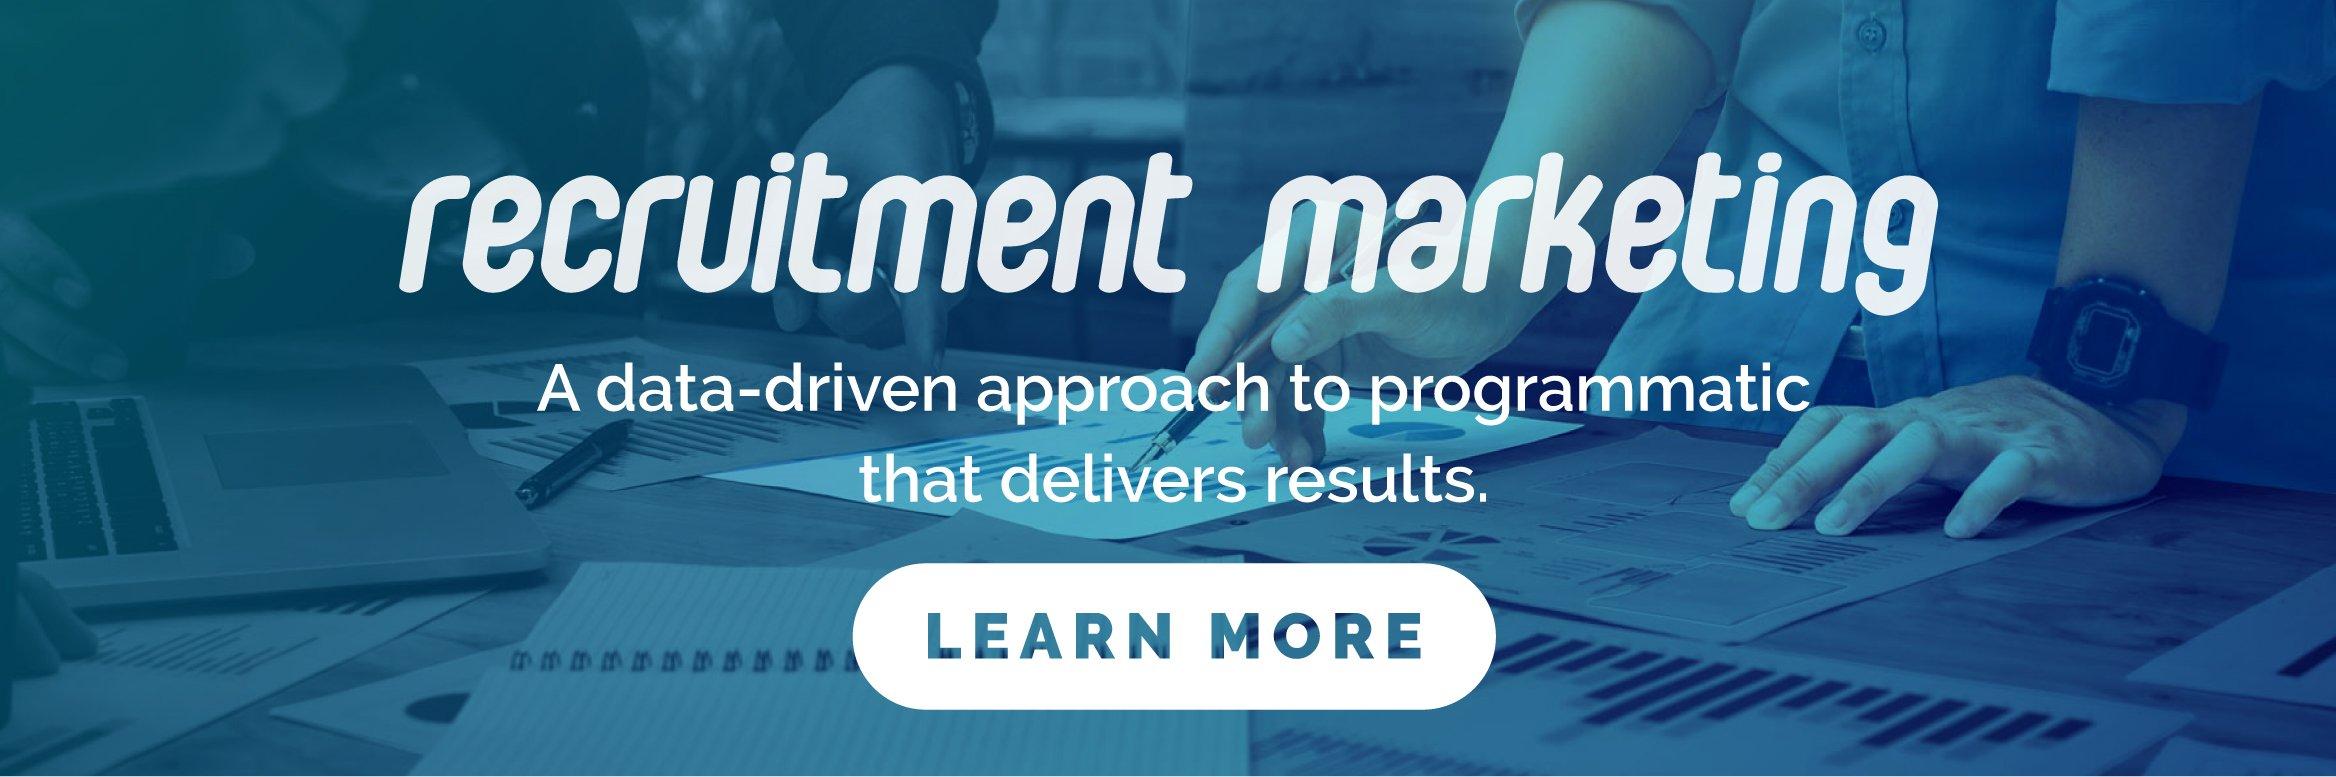 2-Recruitment Marketing